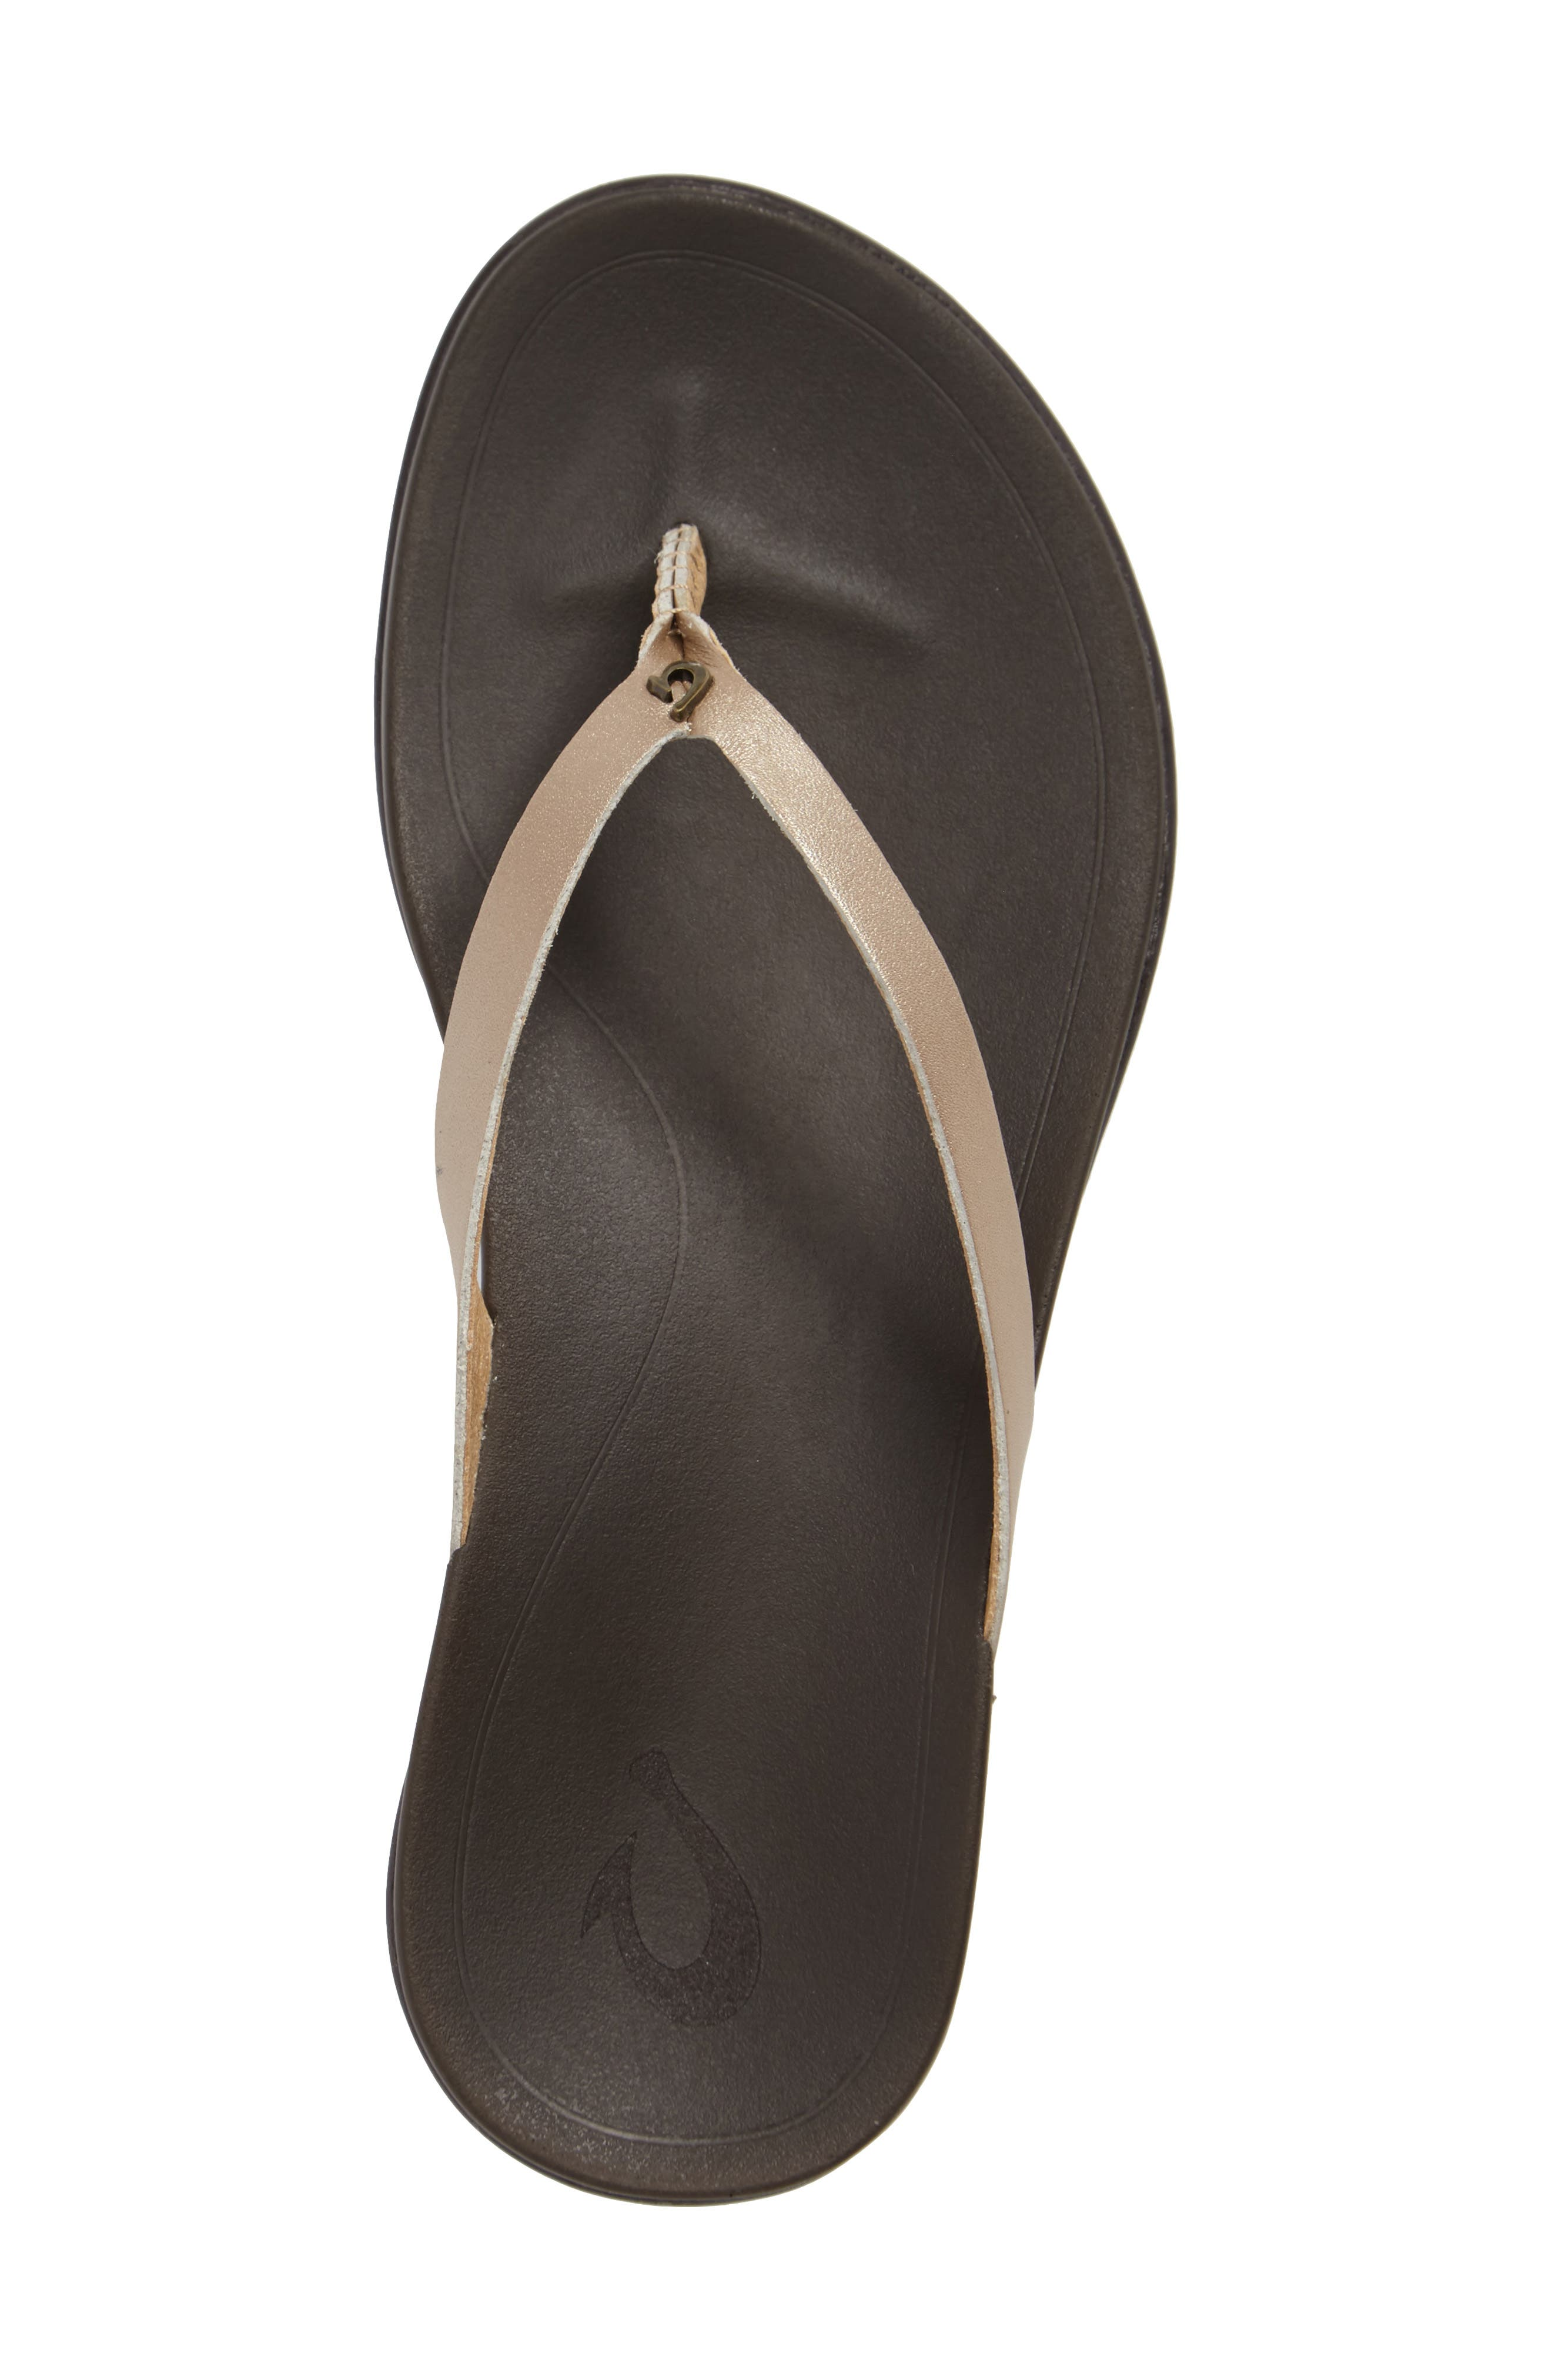 Alternate Image 3  - OluKai 'Ho Opio' Leather Flip Flop (Women)